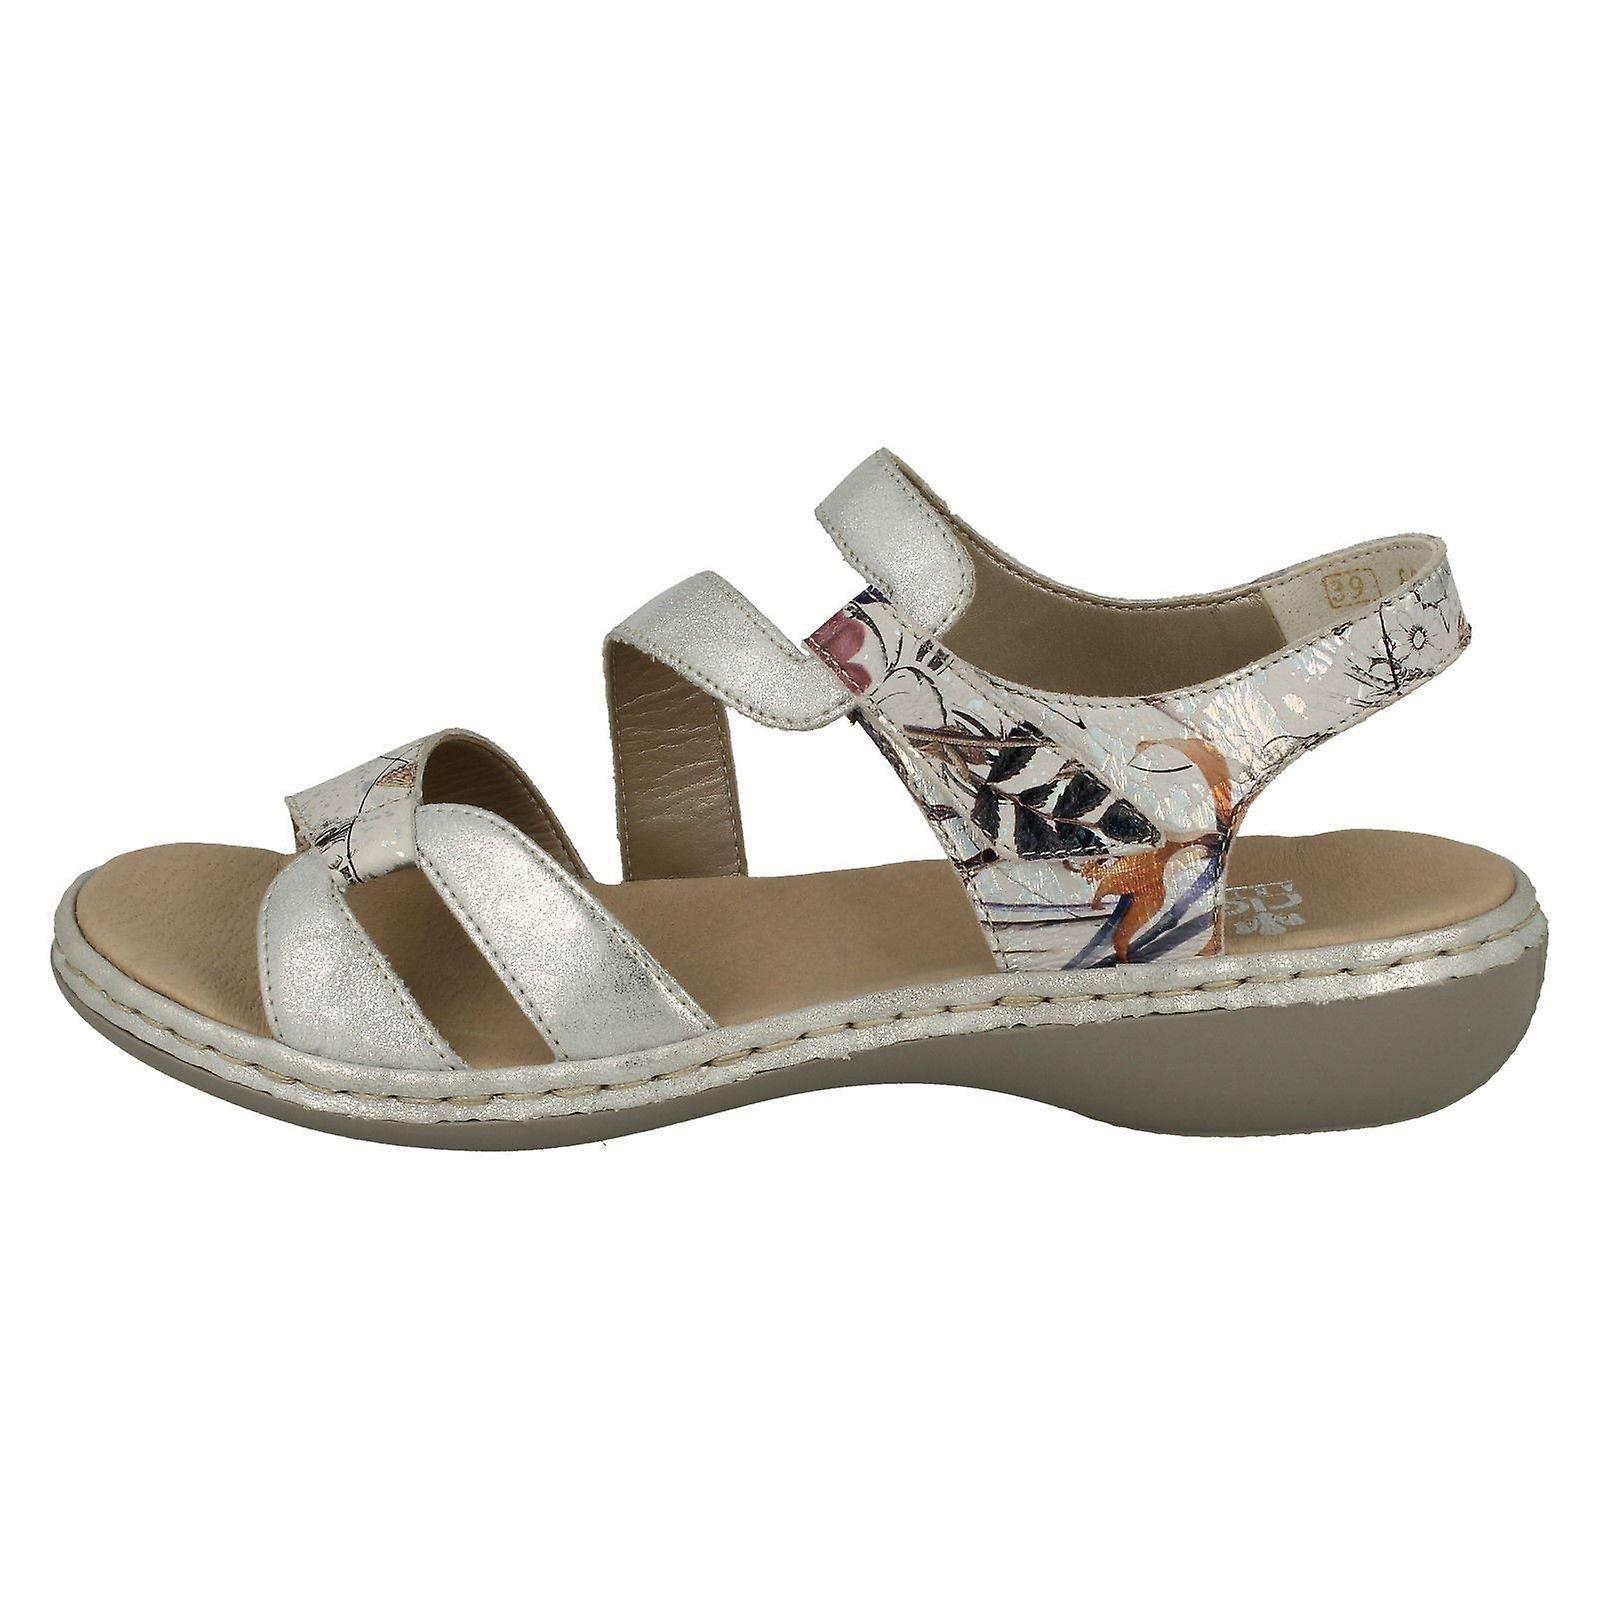 Ladies Rieker Casual Slingback Sandals 65969